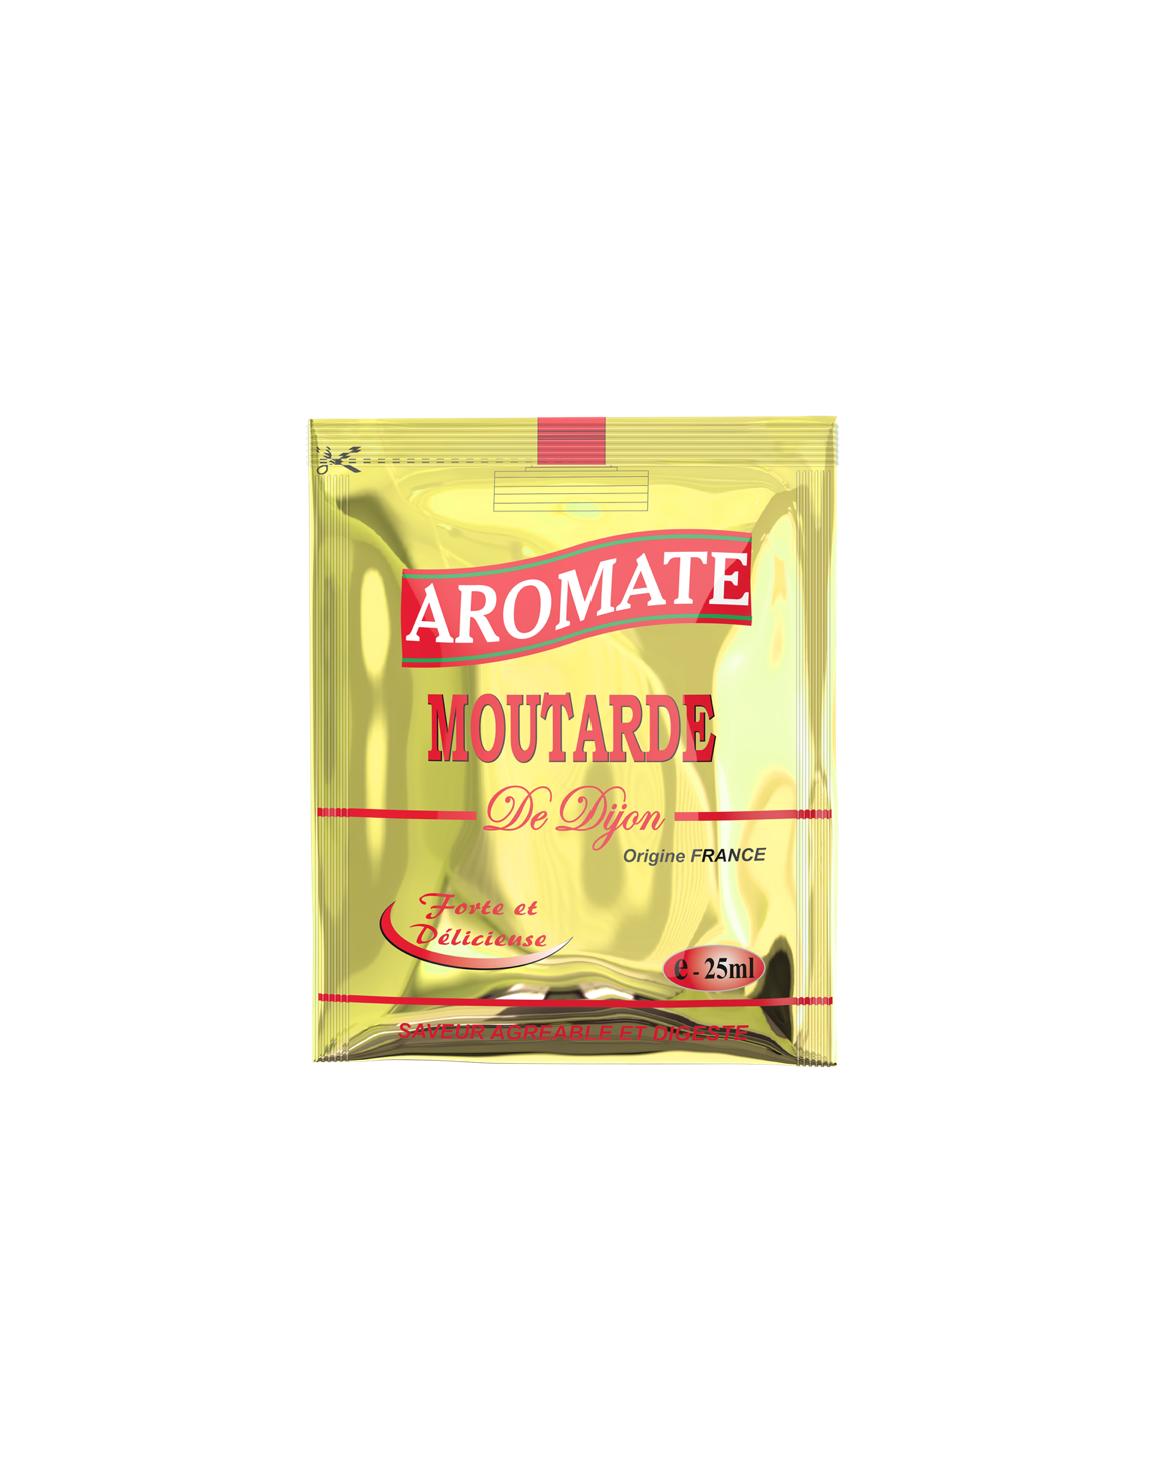 AROMATE_Moutarde-sachet-25ml_Siprochim